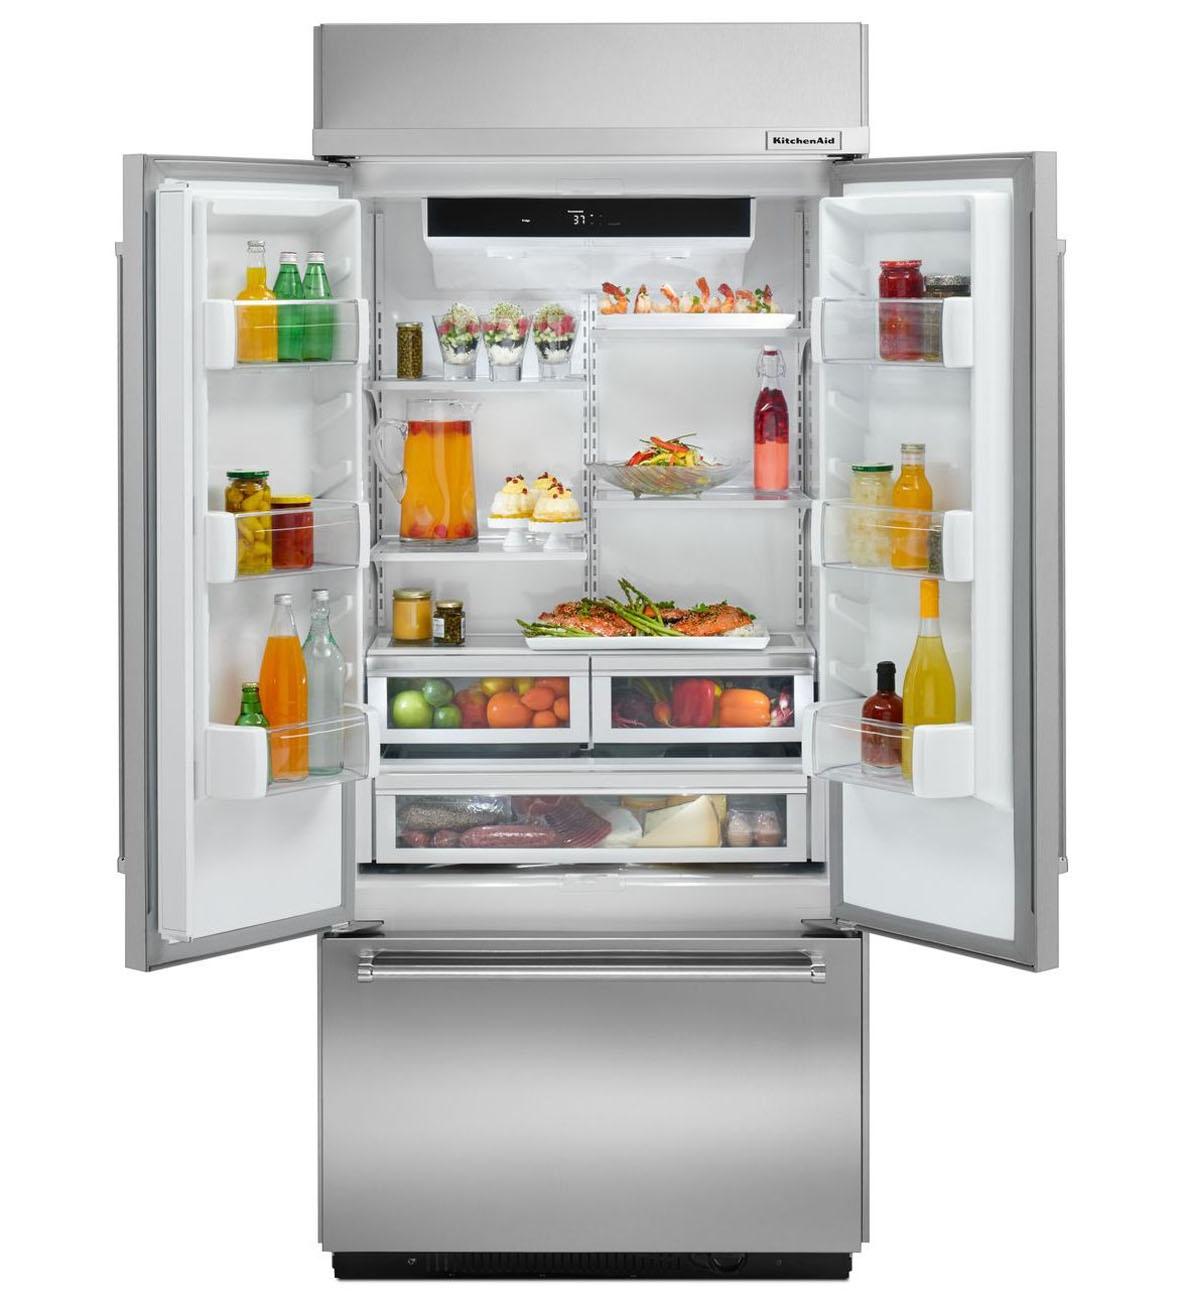 KitchenAid Built-In Panel Ready Refrigerator - KBFN406EPA